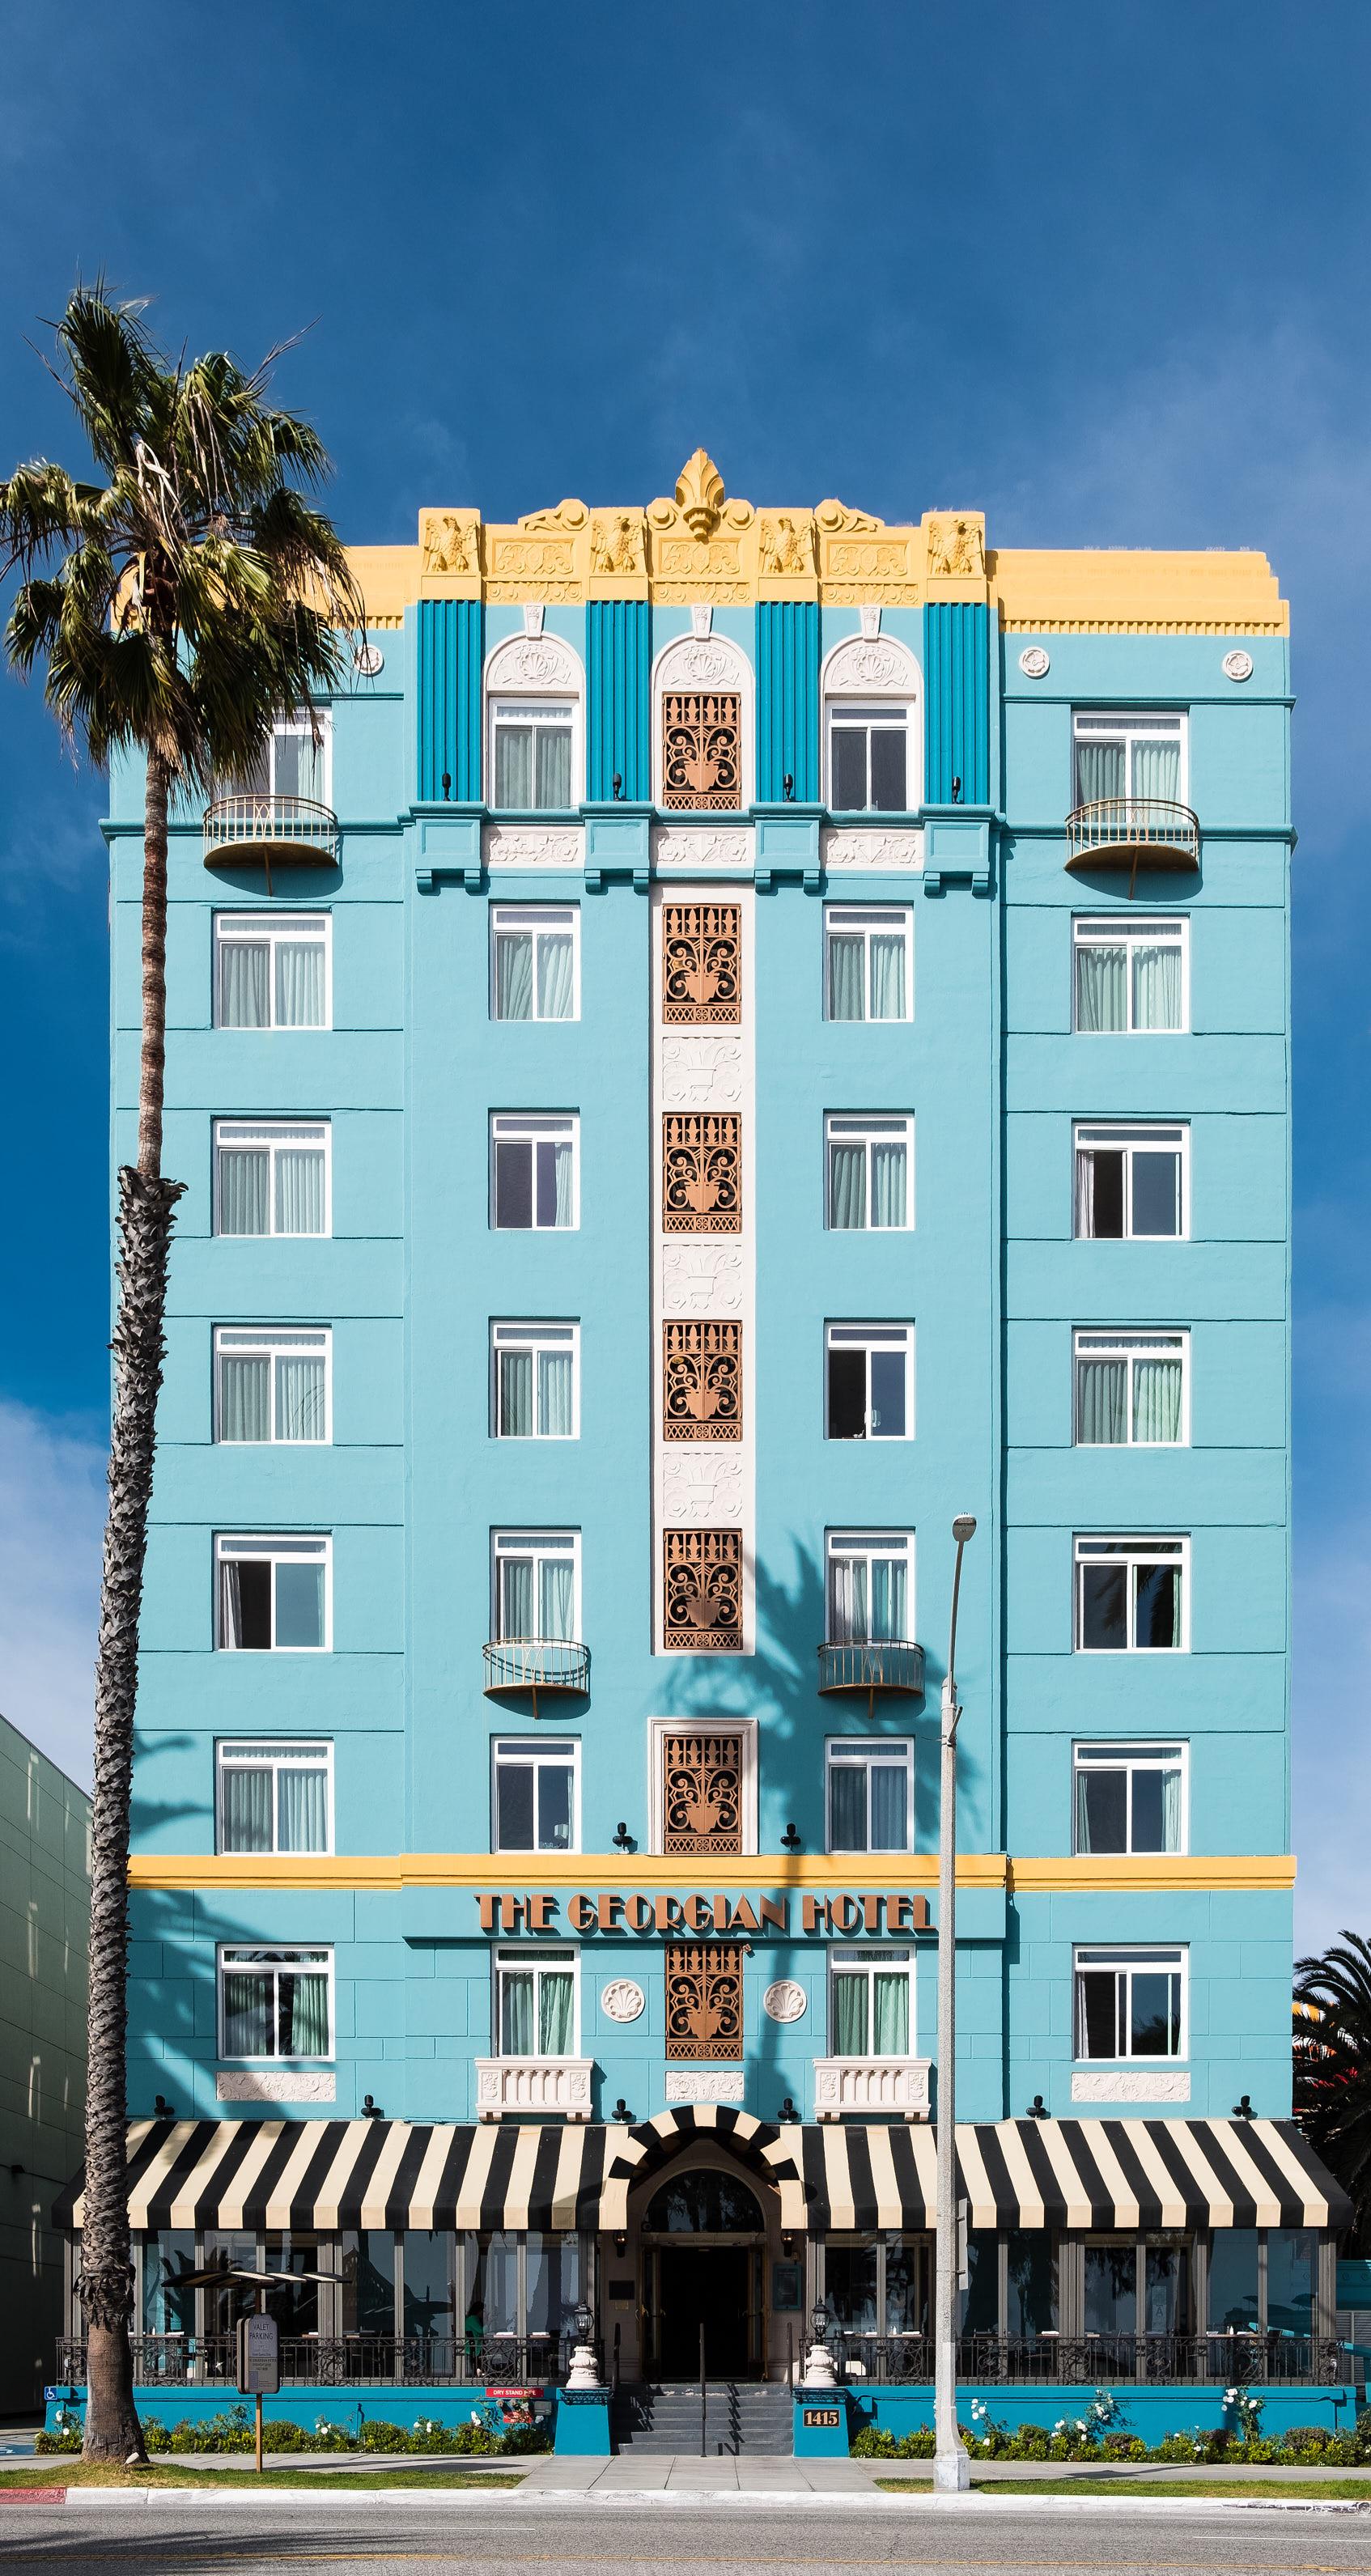 The Georgian Hotel: Santa Monica, California